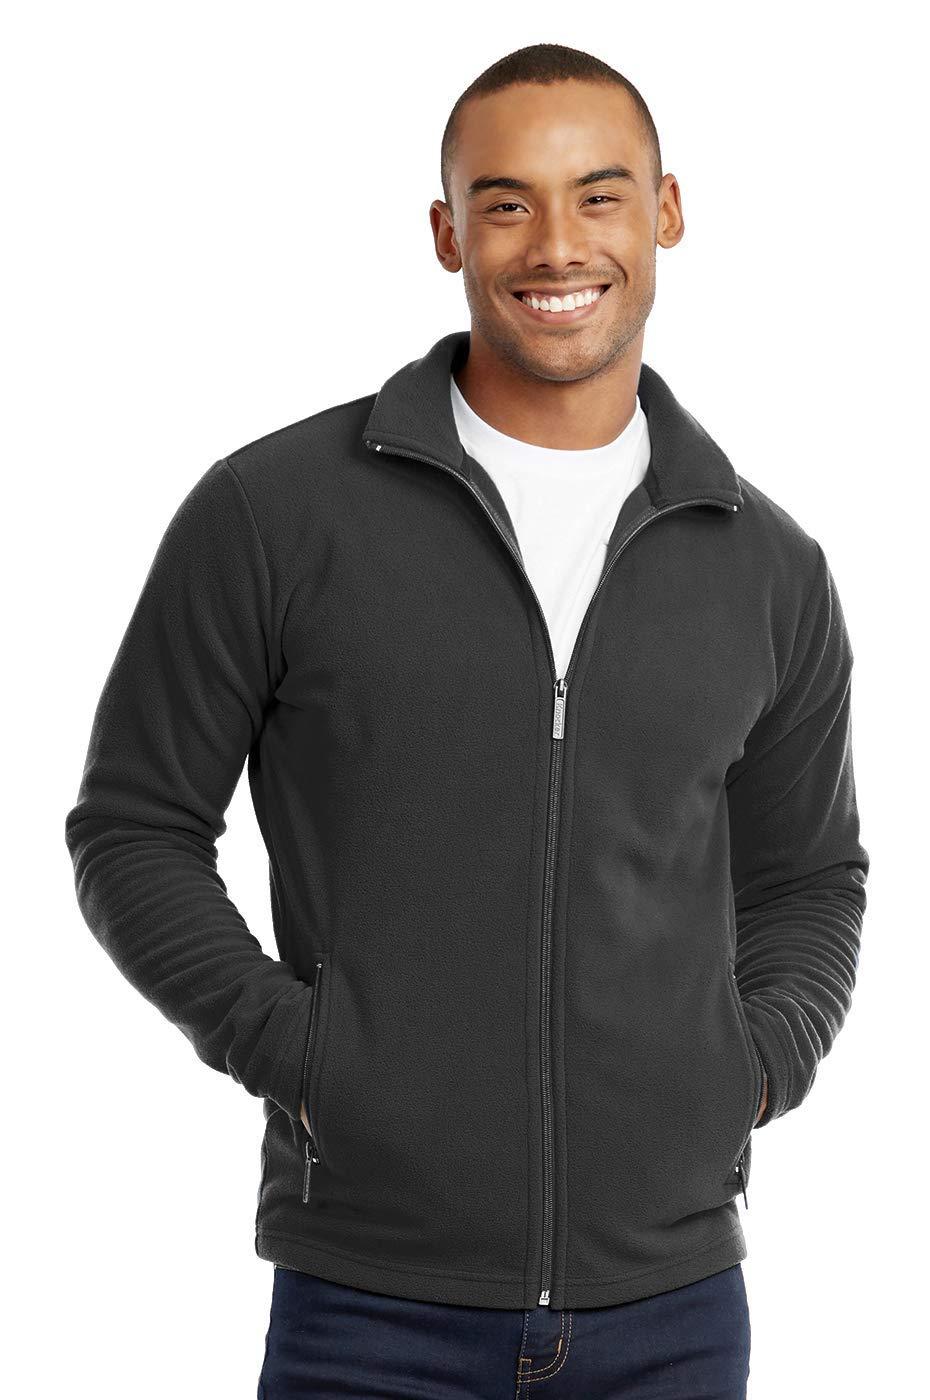 Men's Polar Fleece Zip Up Jacket (M, Charcoal) by Knocker